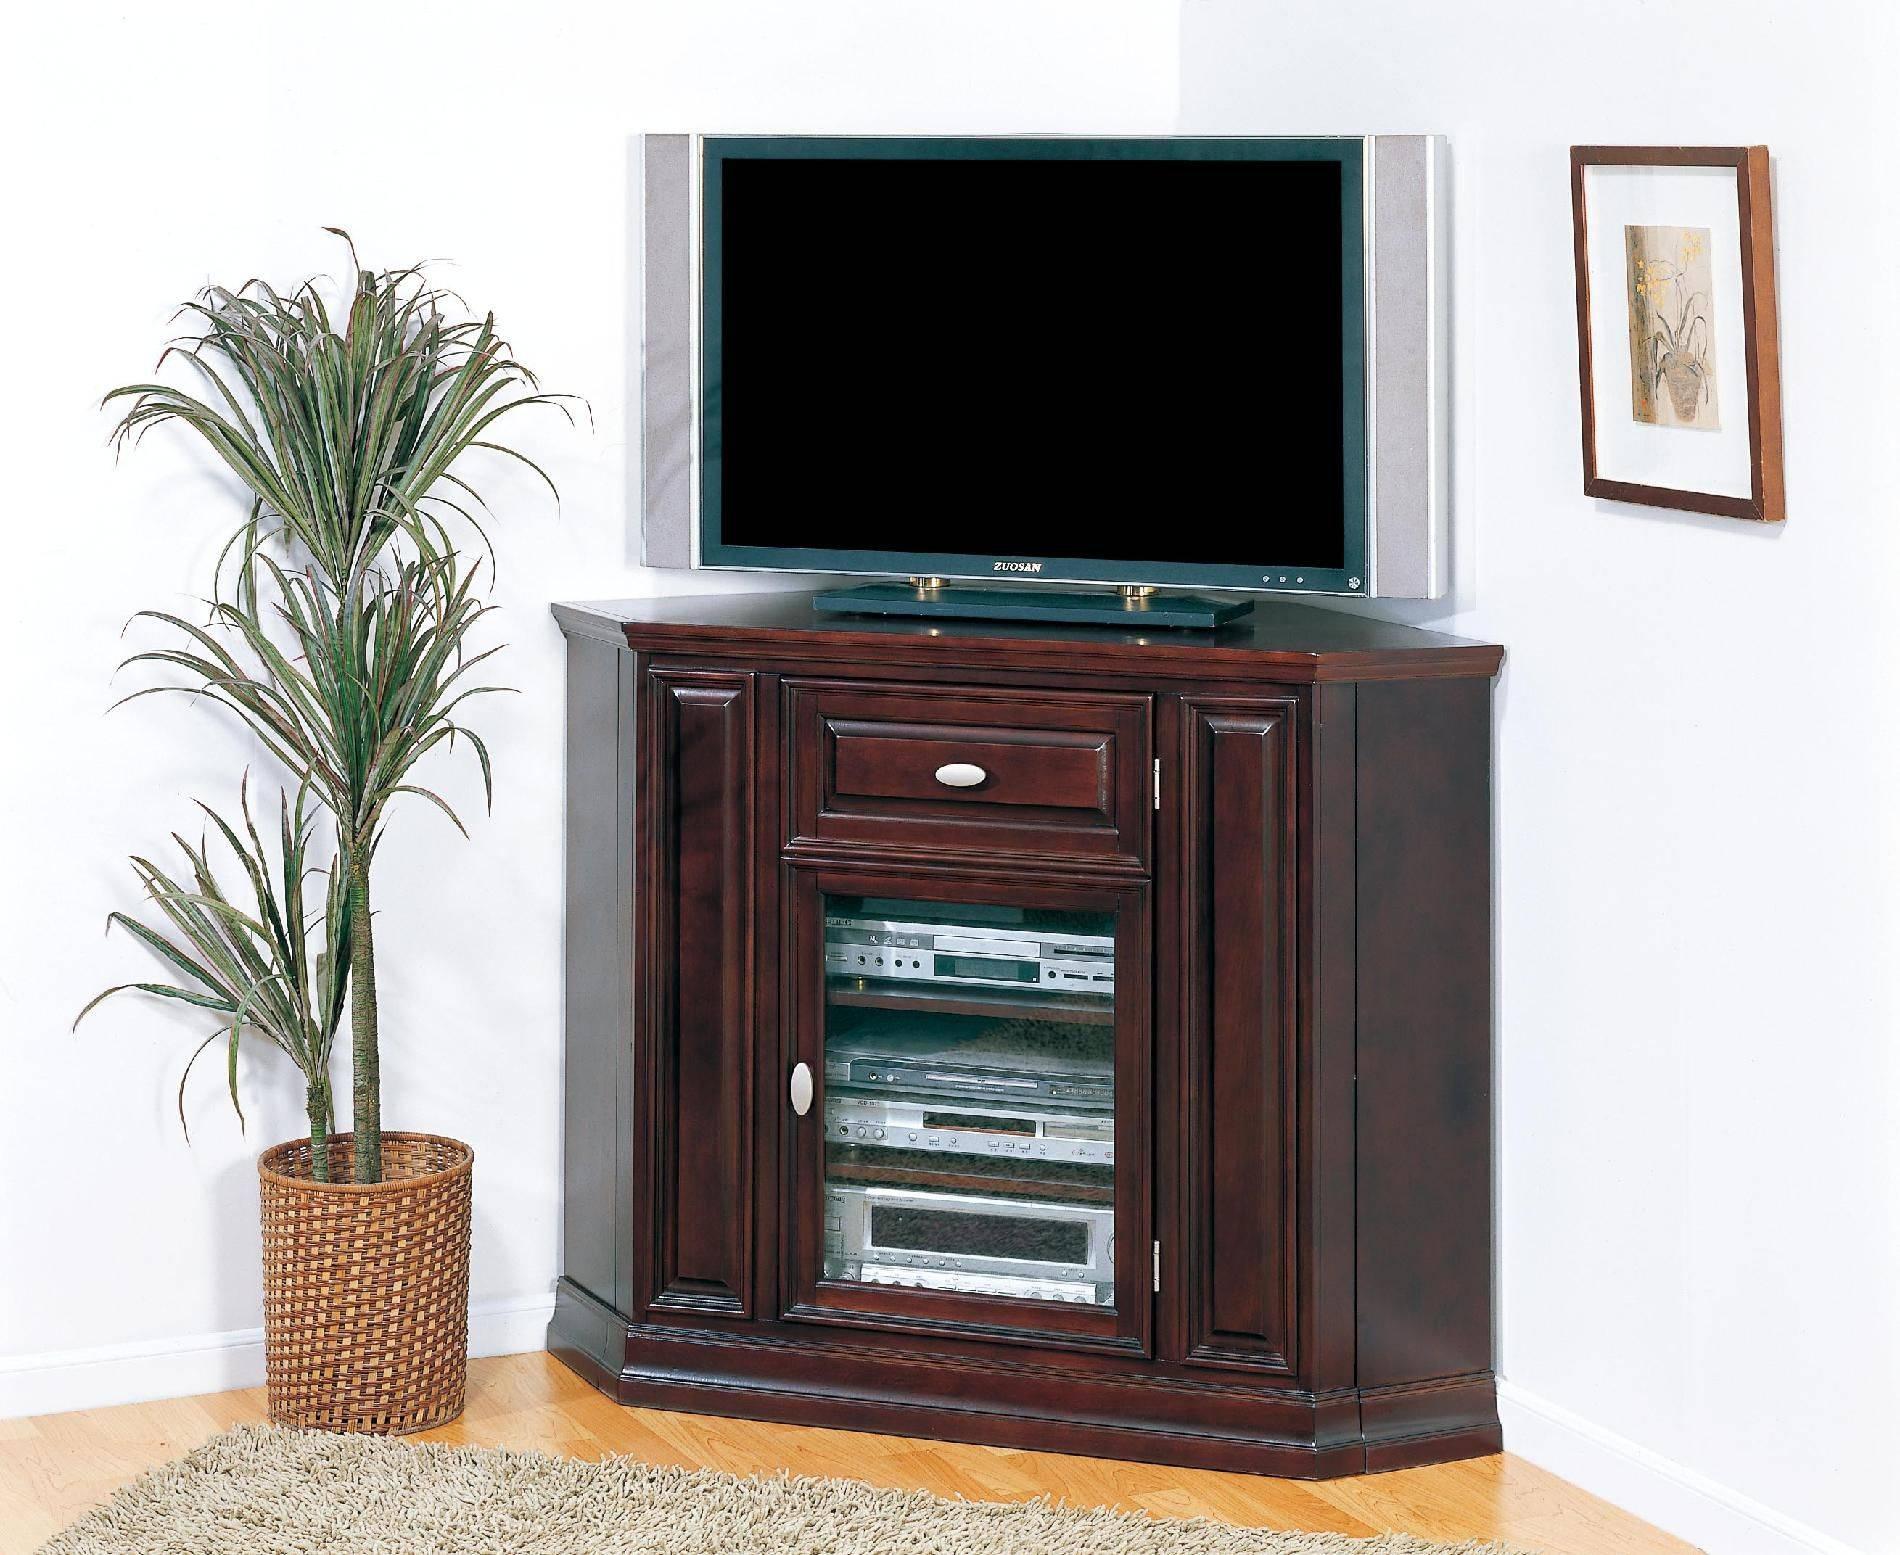 Furniture. Tall Dark Brown Wood Corner Tv Cabinet For Flat Screen within Dark Brown Corner Tv Stands (Image 8 of 15)